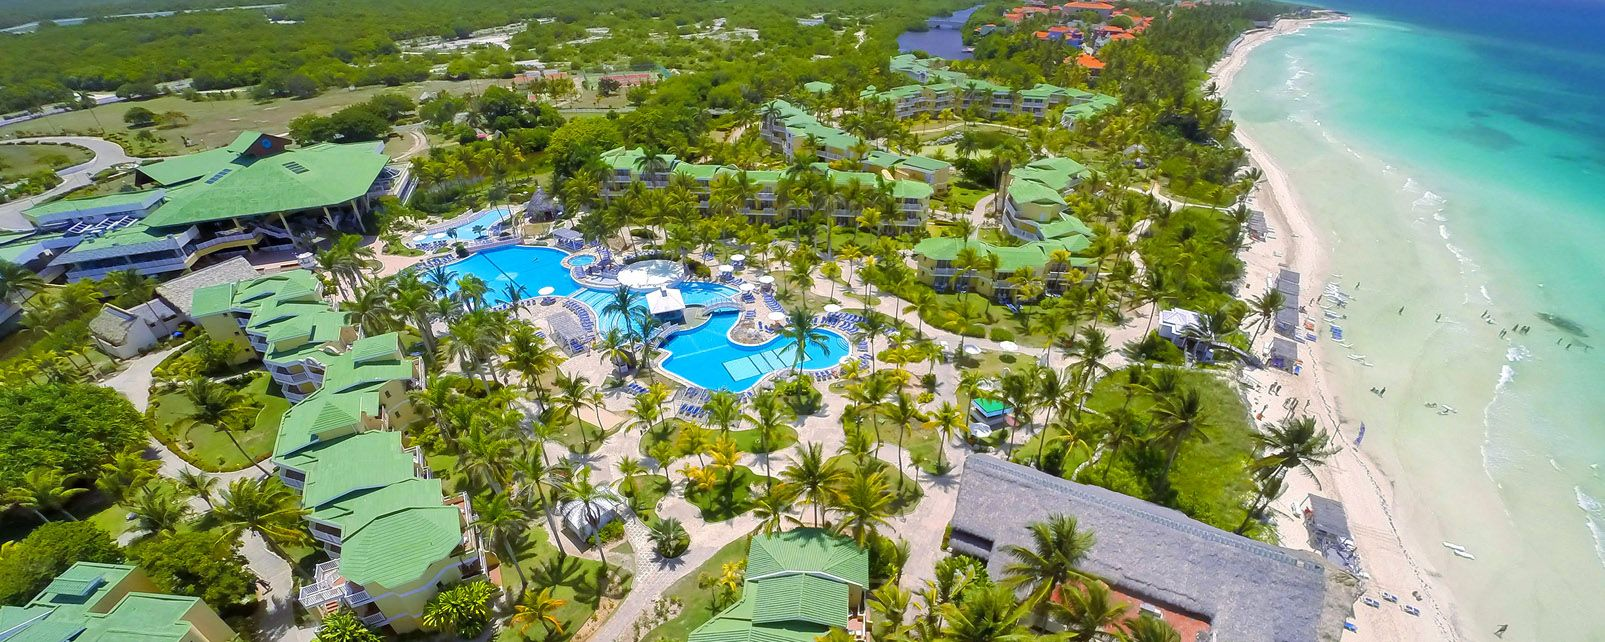 Hotel Tryp Cayo Coco